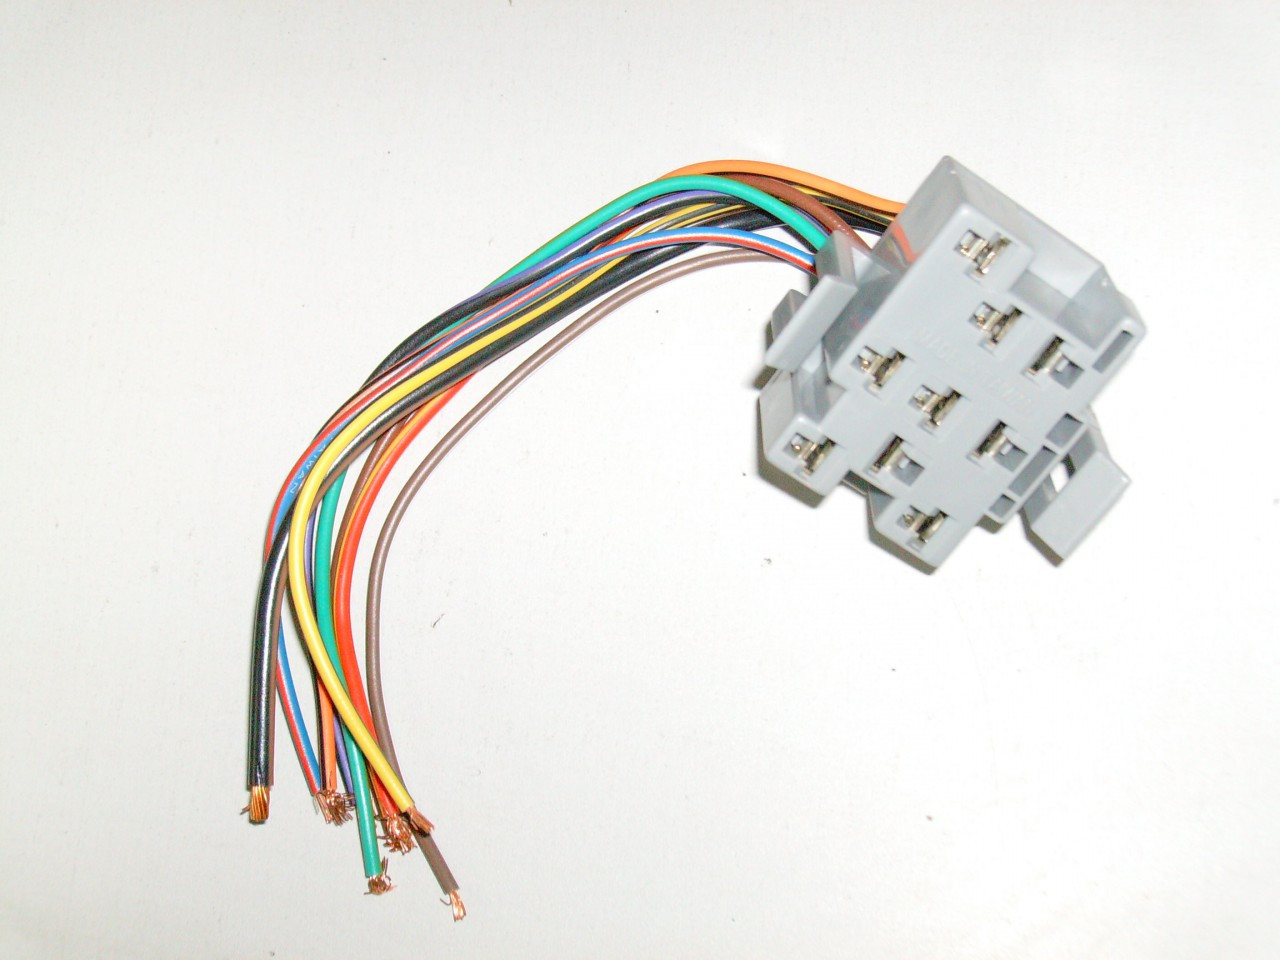 mustang headlight switch plug wire harness socket gt lx cobra price 25 98 image 1 [ 1280 x 960 Pixel ]